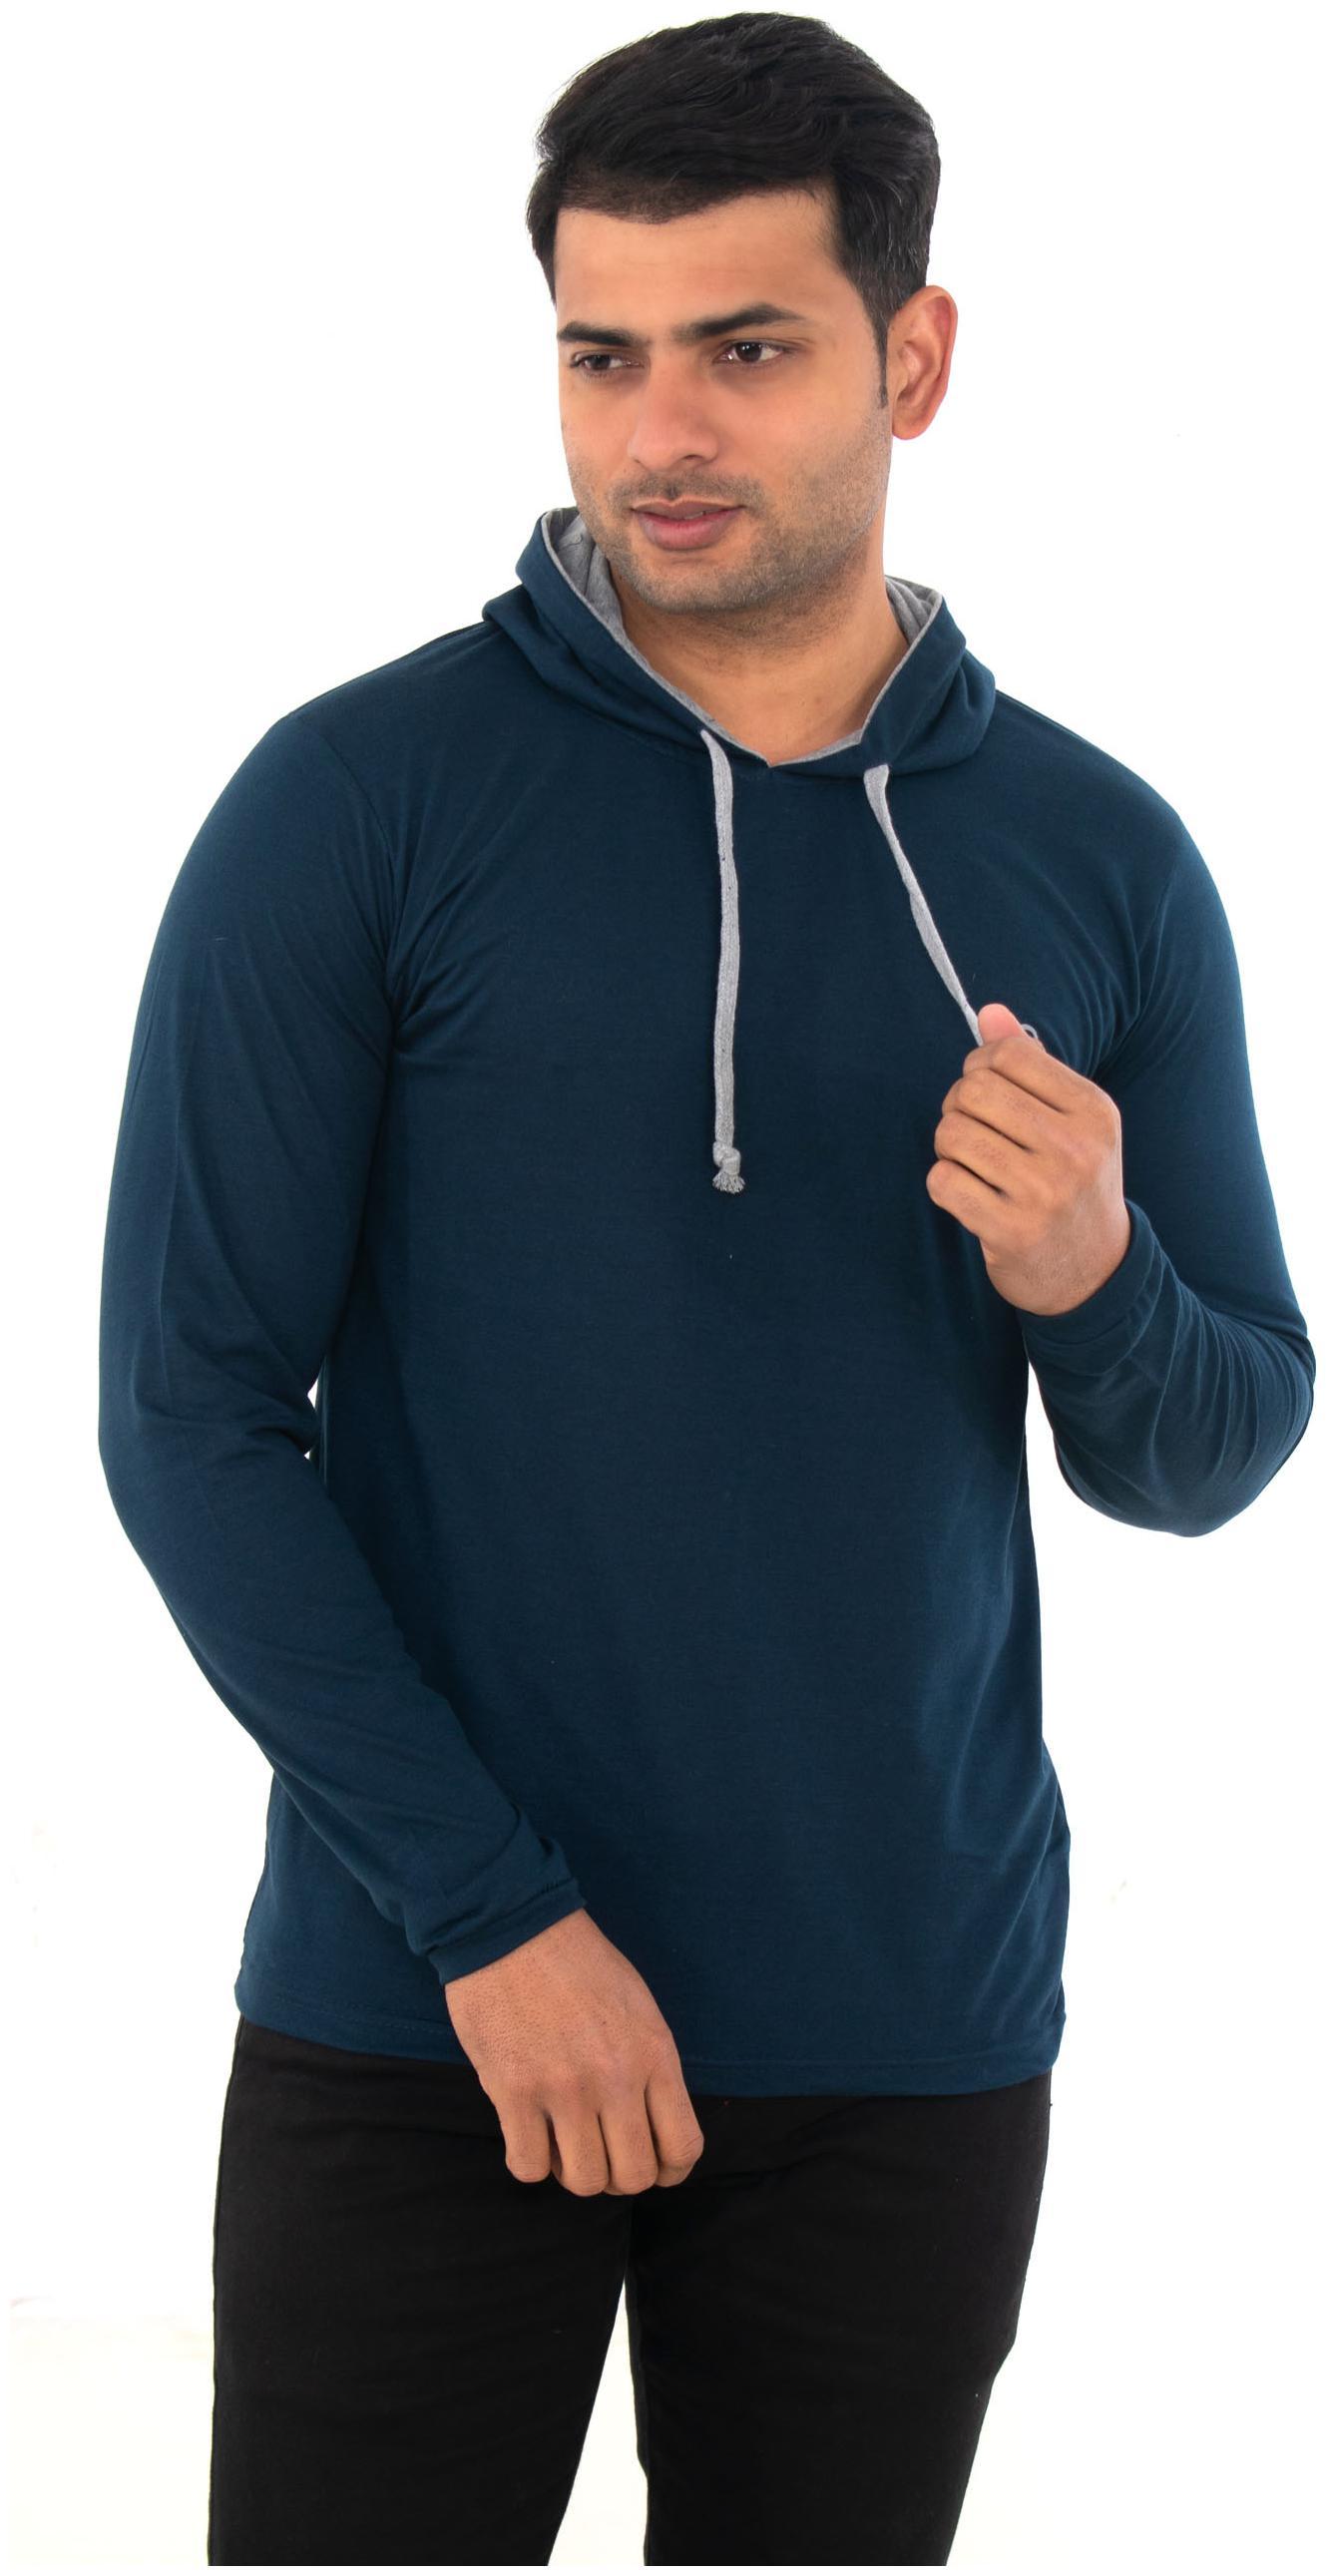 SKYBEN premium quality tshirt with comfort fit and unique design. Blue color